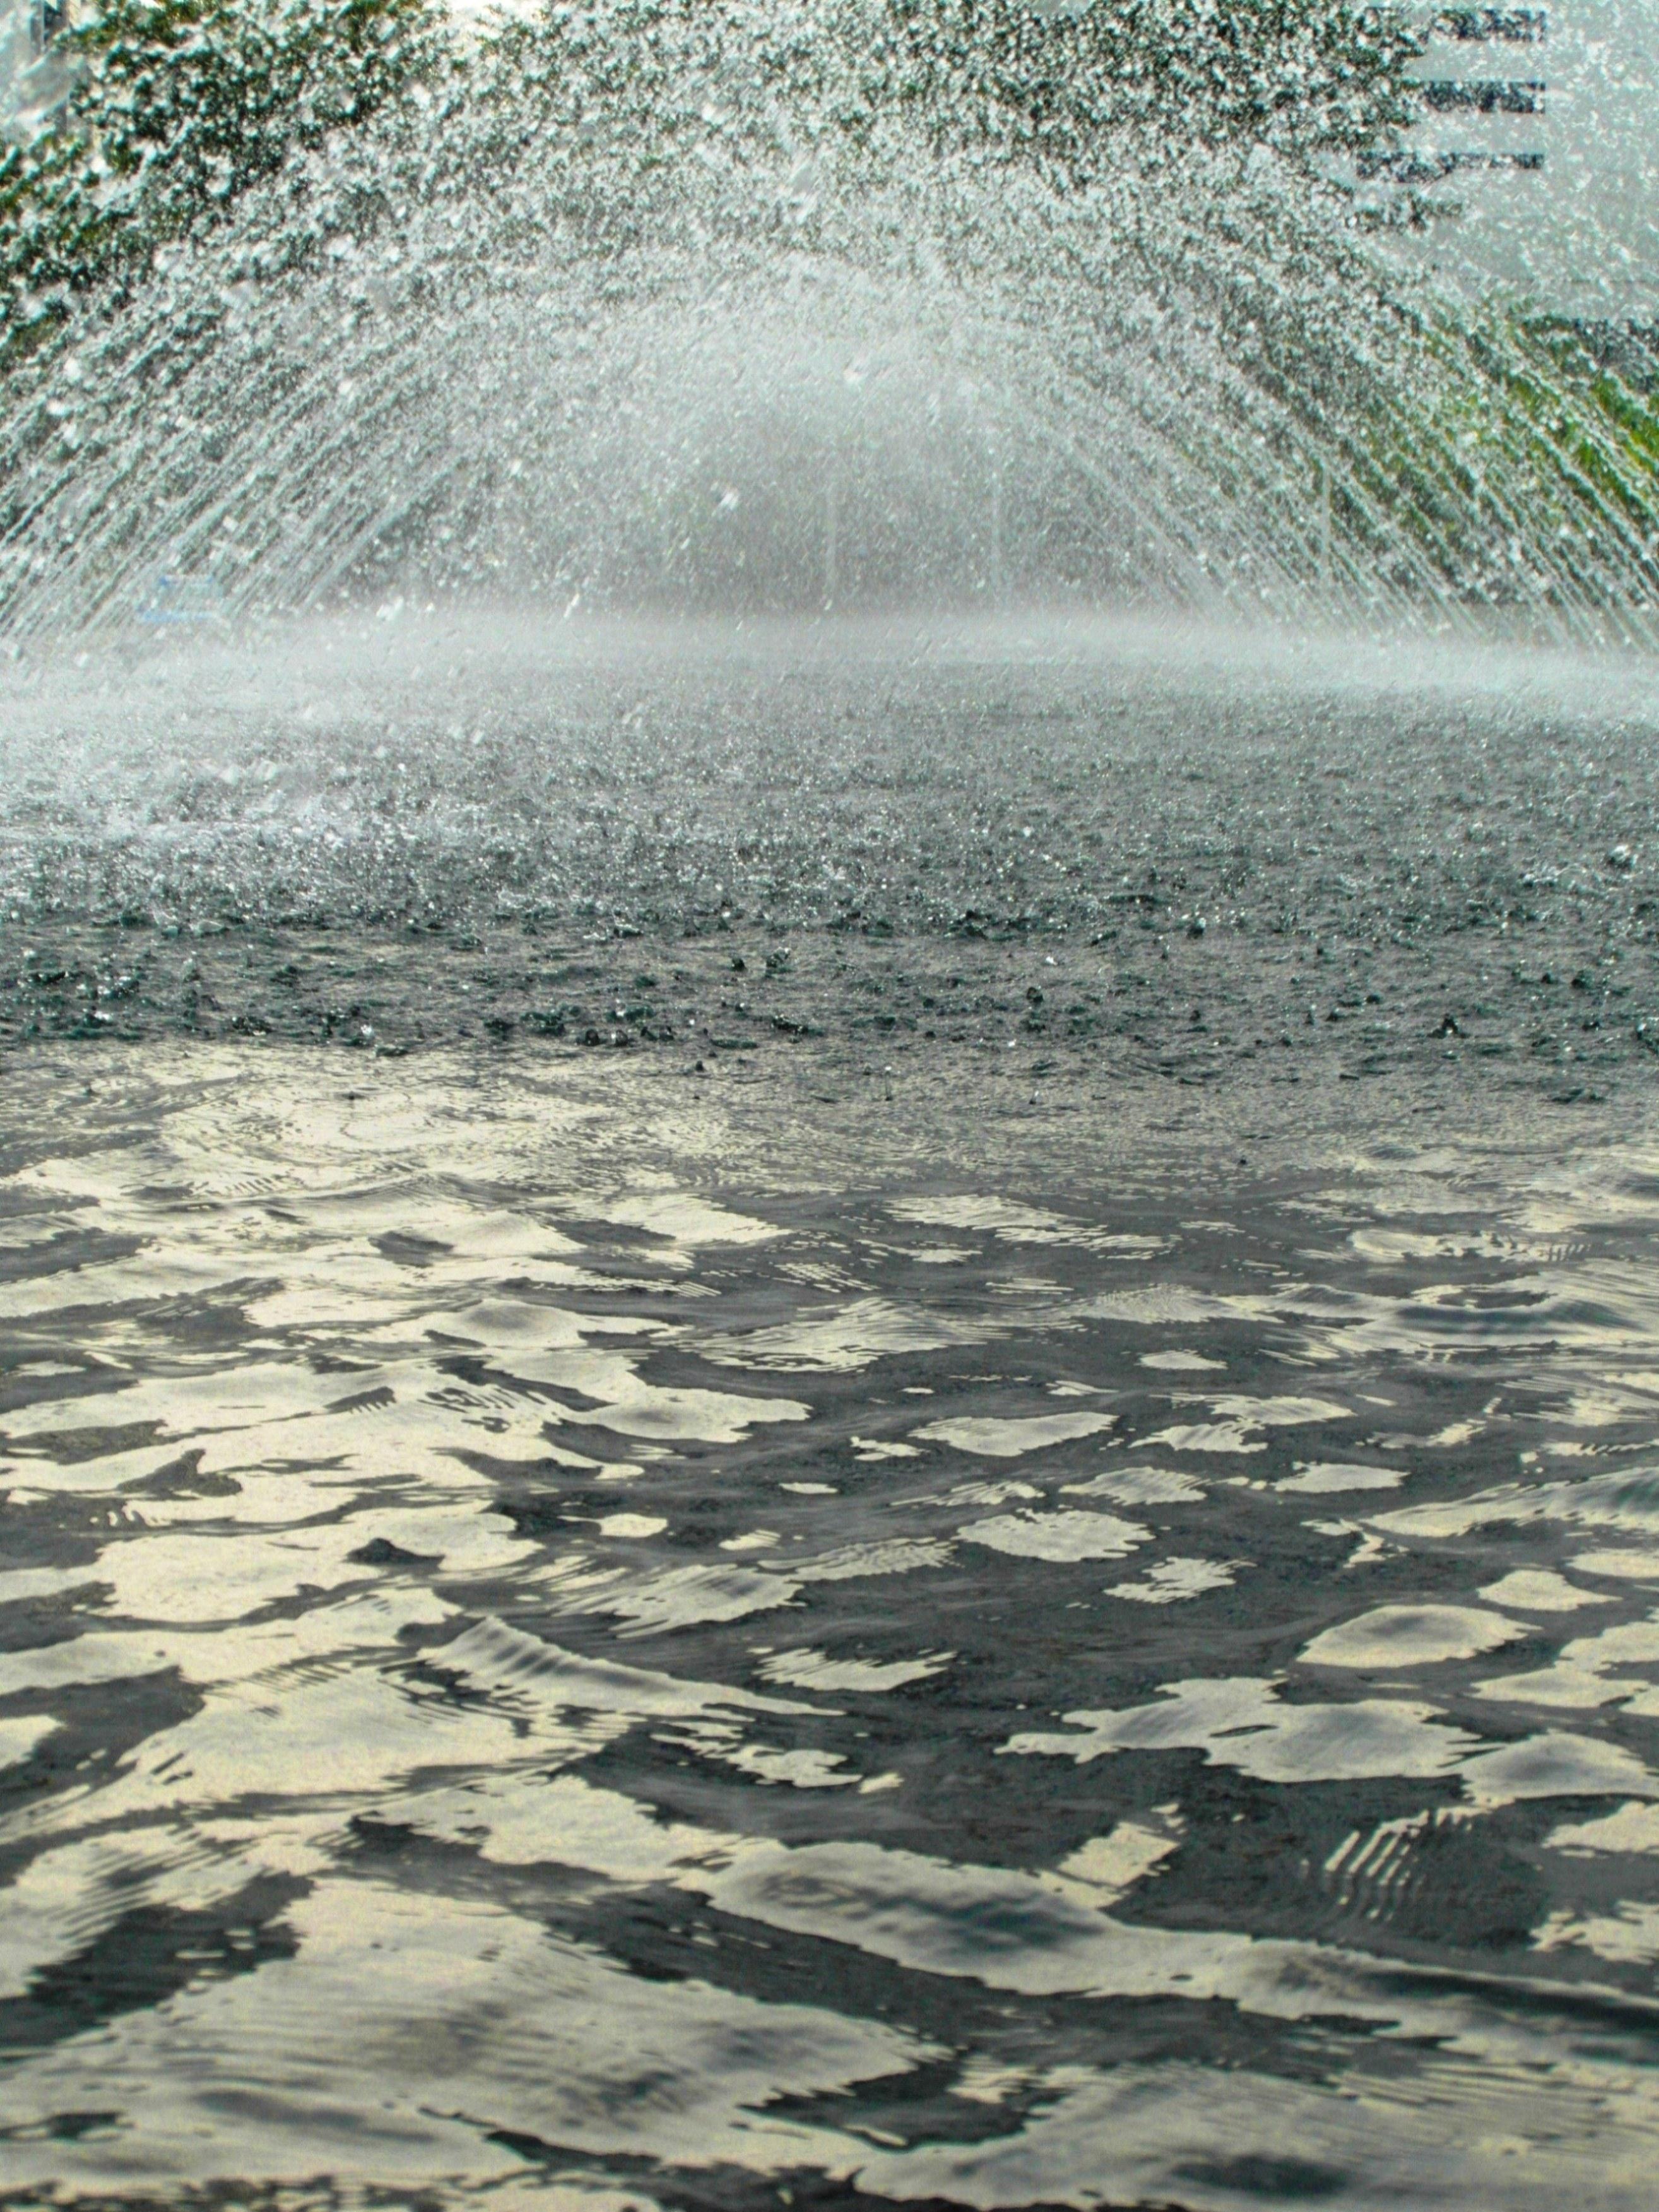 Water Display, Abstract, Splashing, Park, Pond, HQ Photo